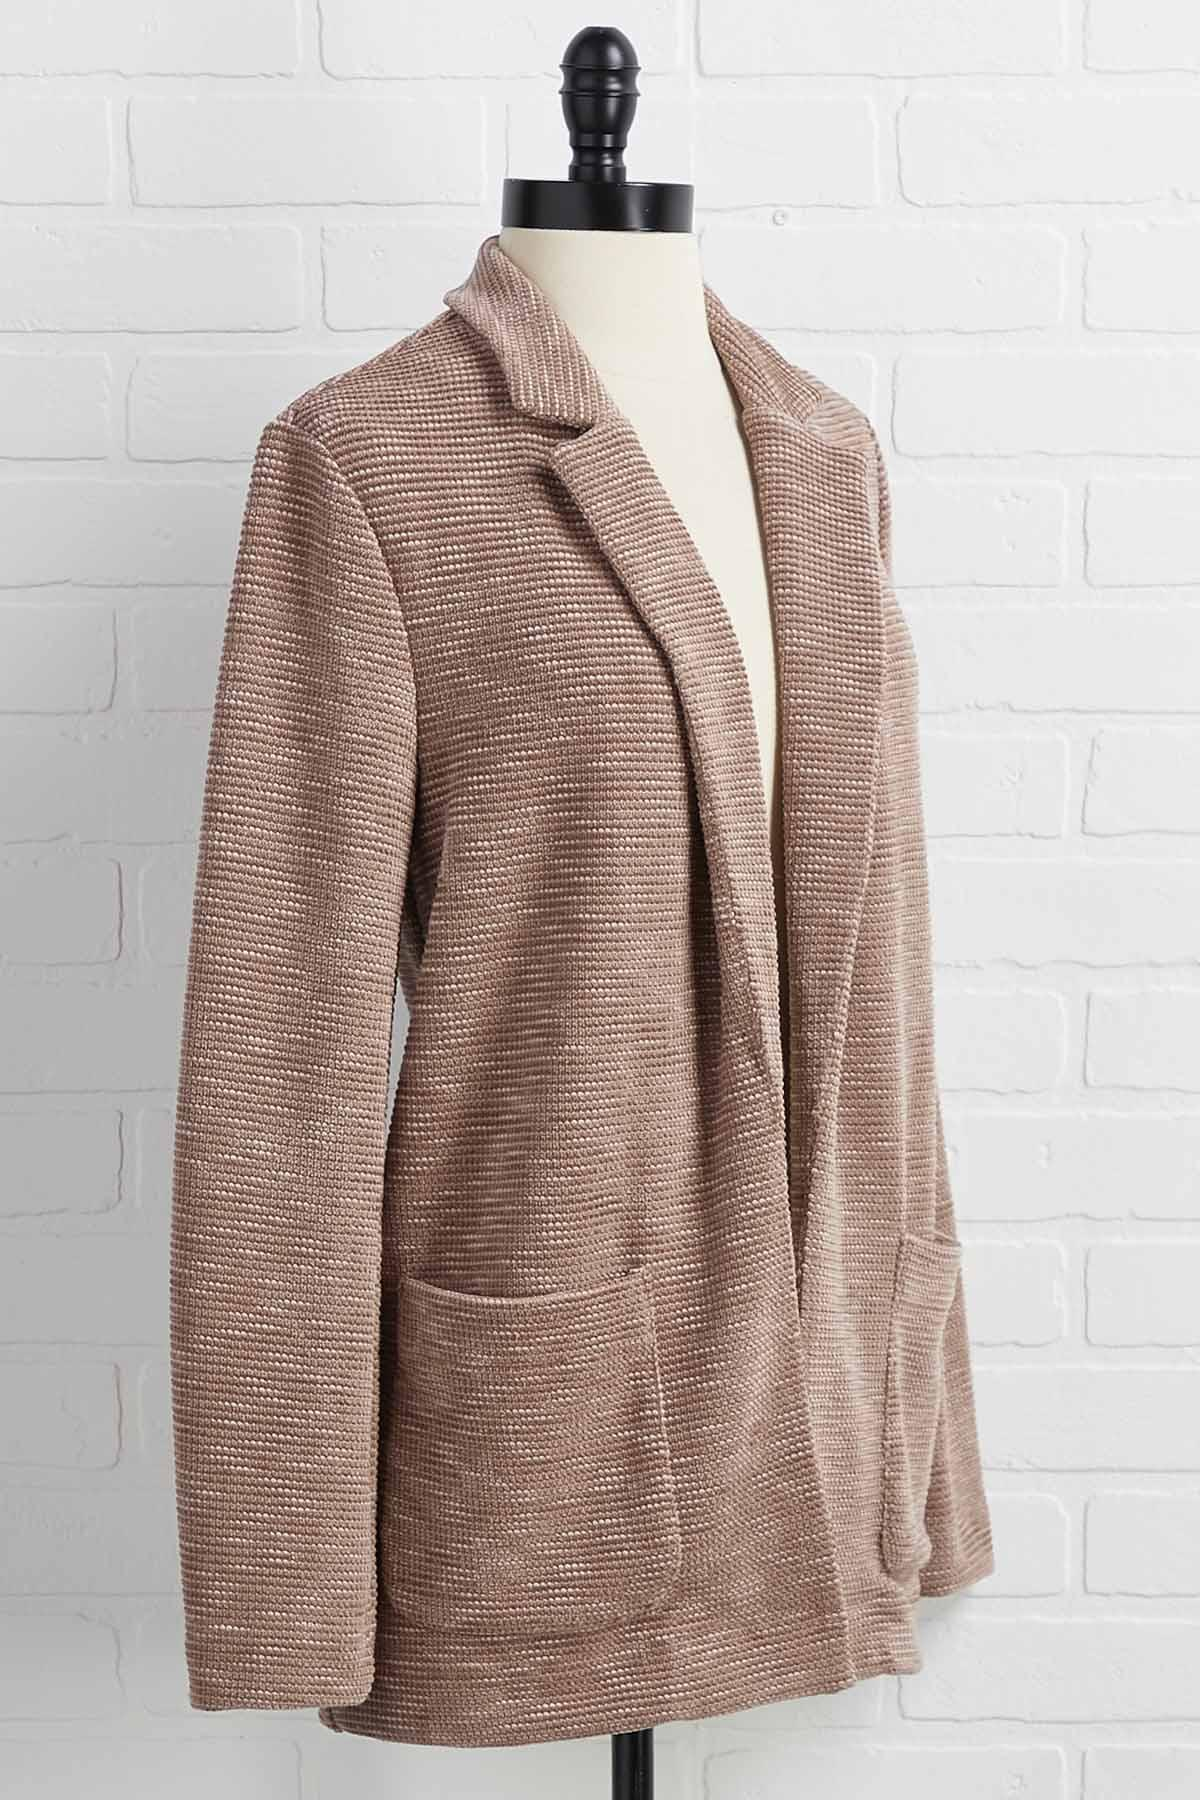 Wintertime Chill Jacket